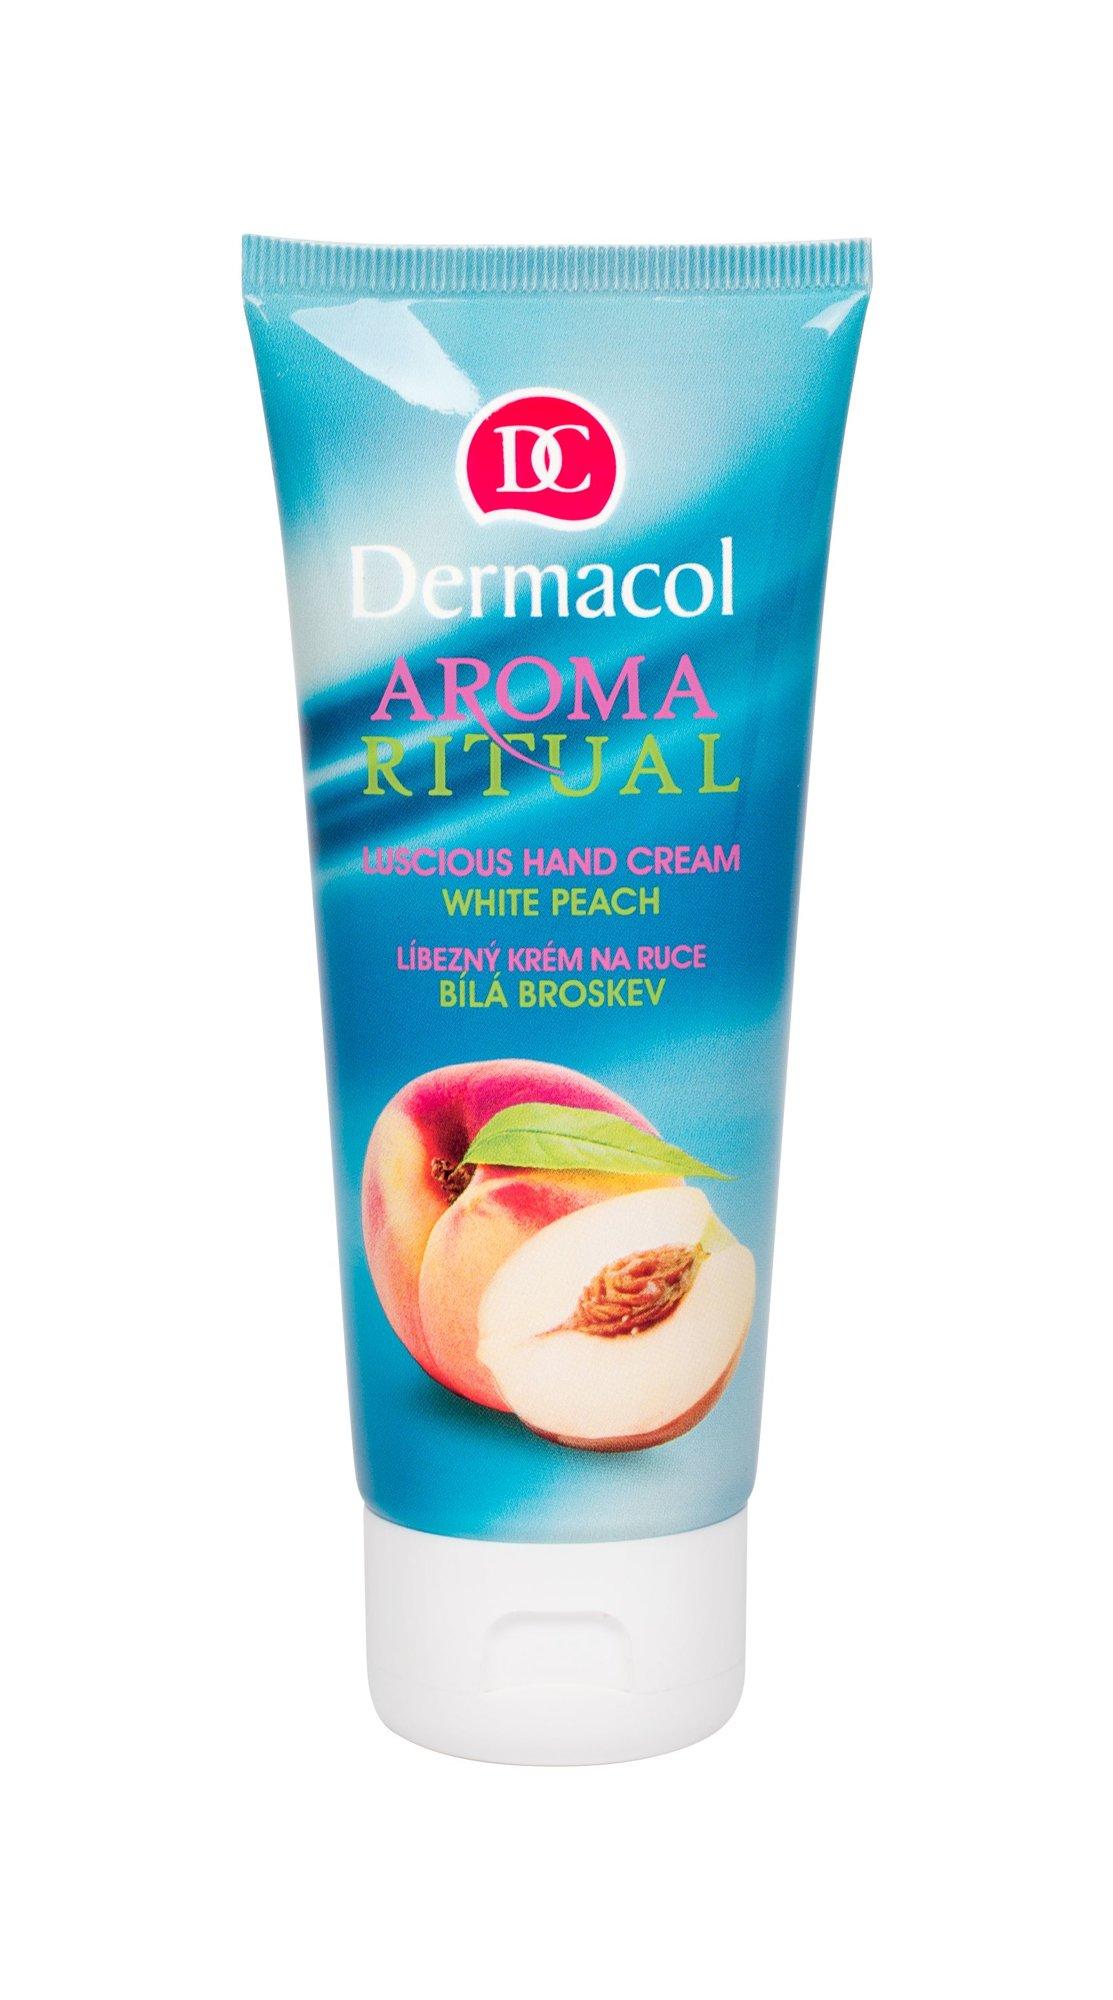 Dermacol Aroma Ritual Hand Cream 100ml